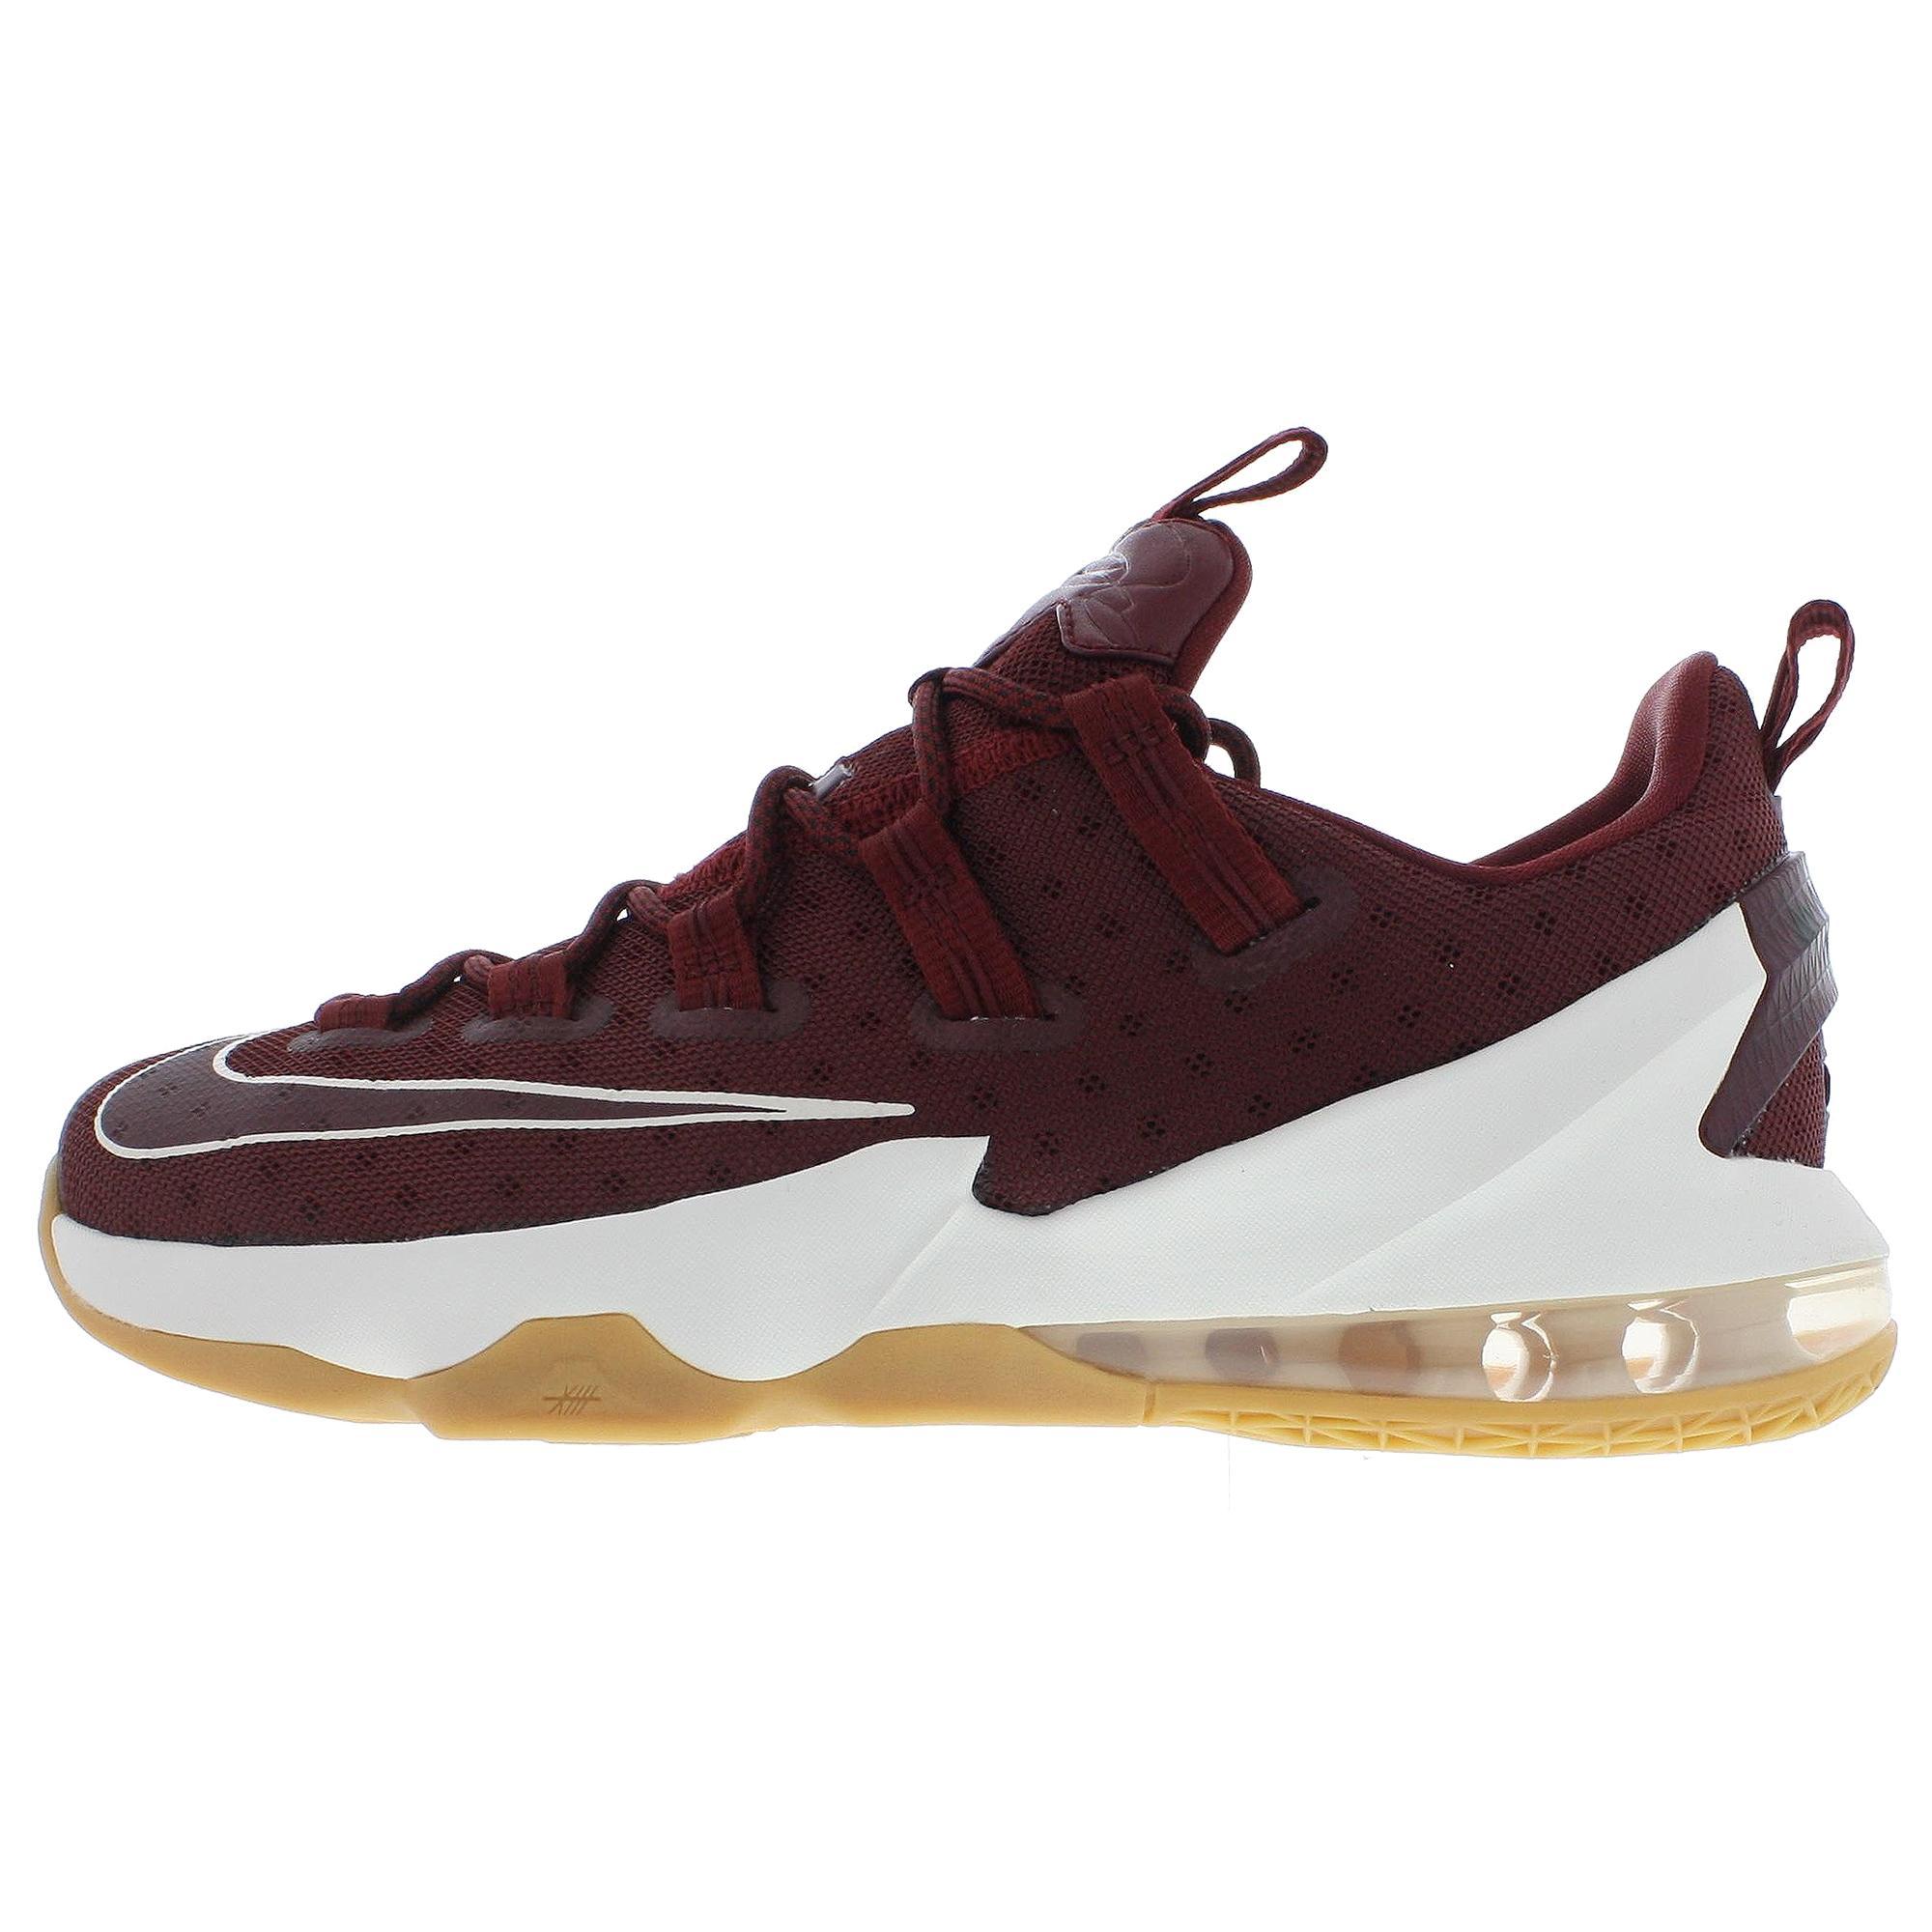 d49d1848a4313 Nike LeBron James XIII Low SS16 Erkek Basketbol Ayakkabısı  831925 ...